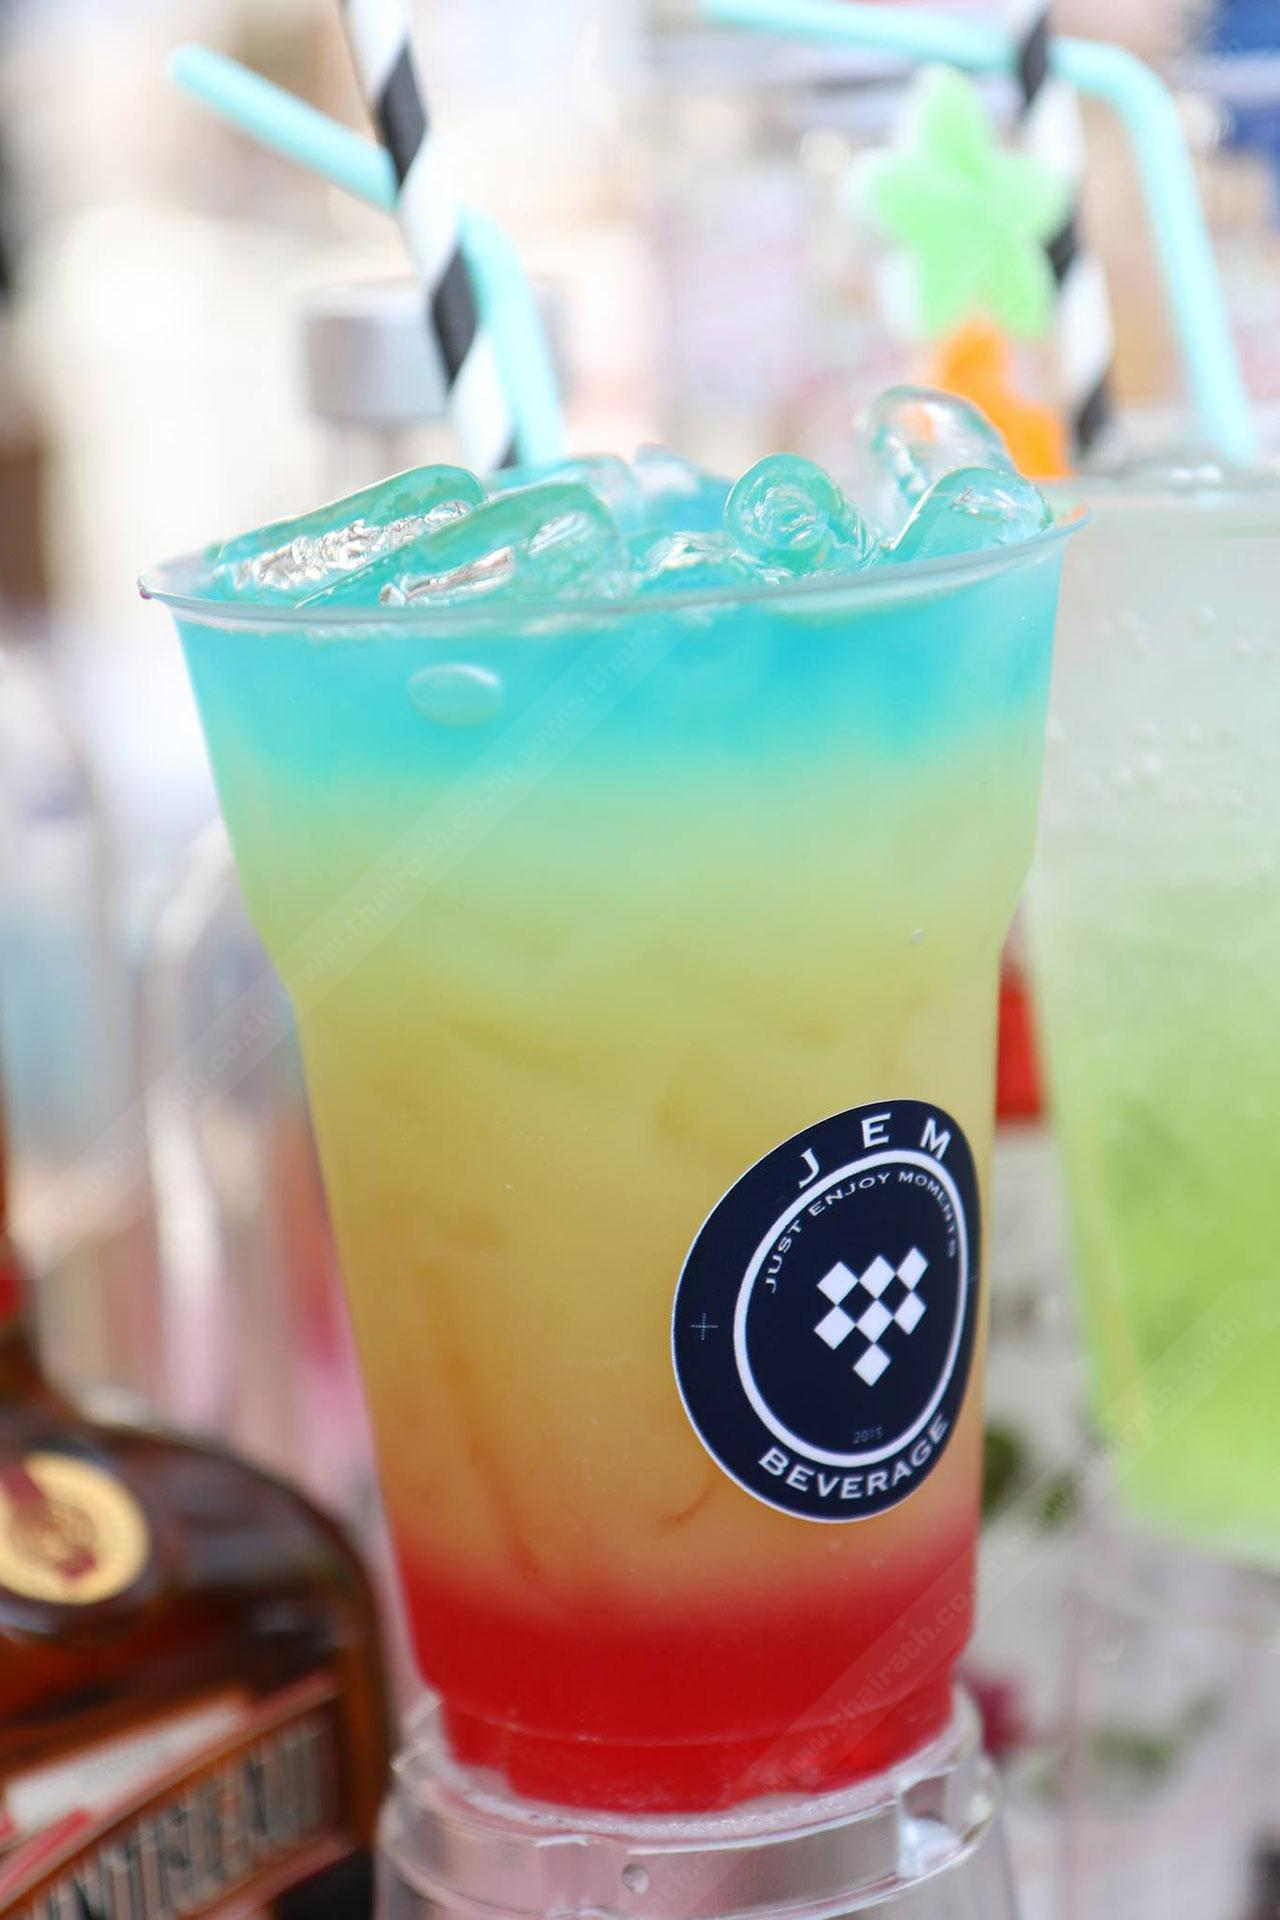 rainbow mocktail เครื่องดื่มทีเด็ดของร้าน JEM